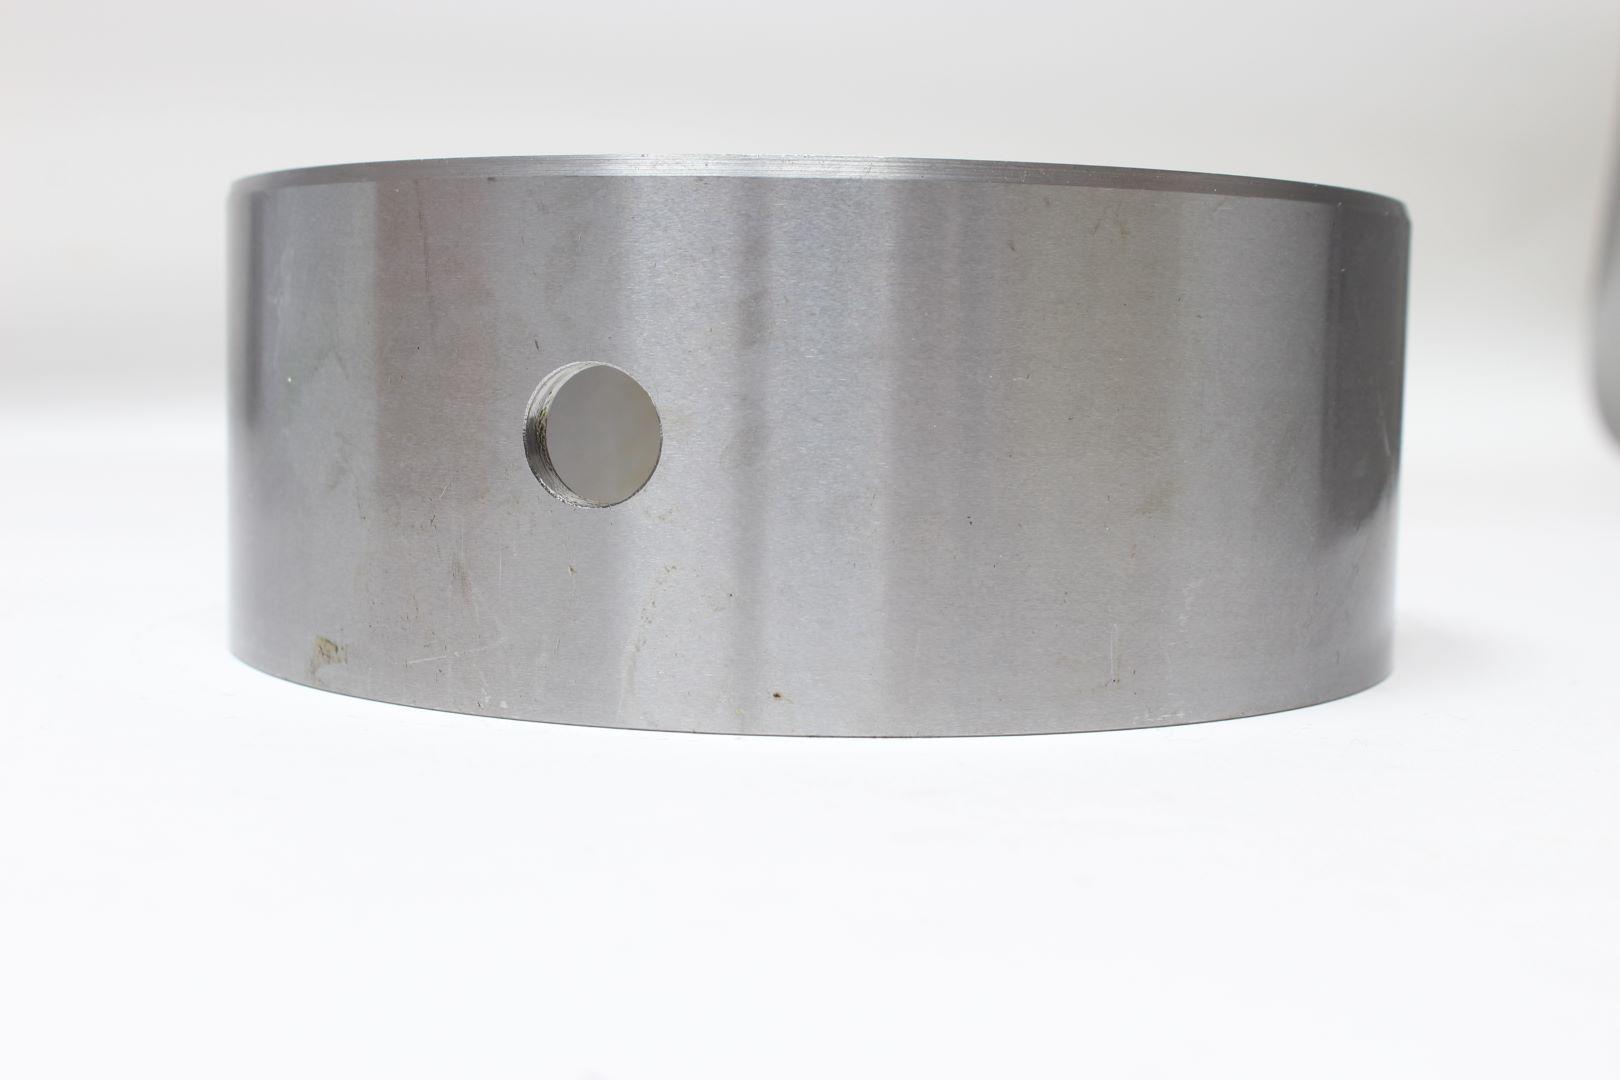 Bucha carcaca cavalete dianteiro APL359/AS3065